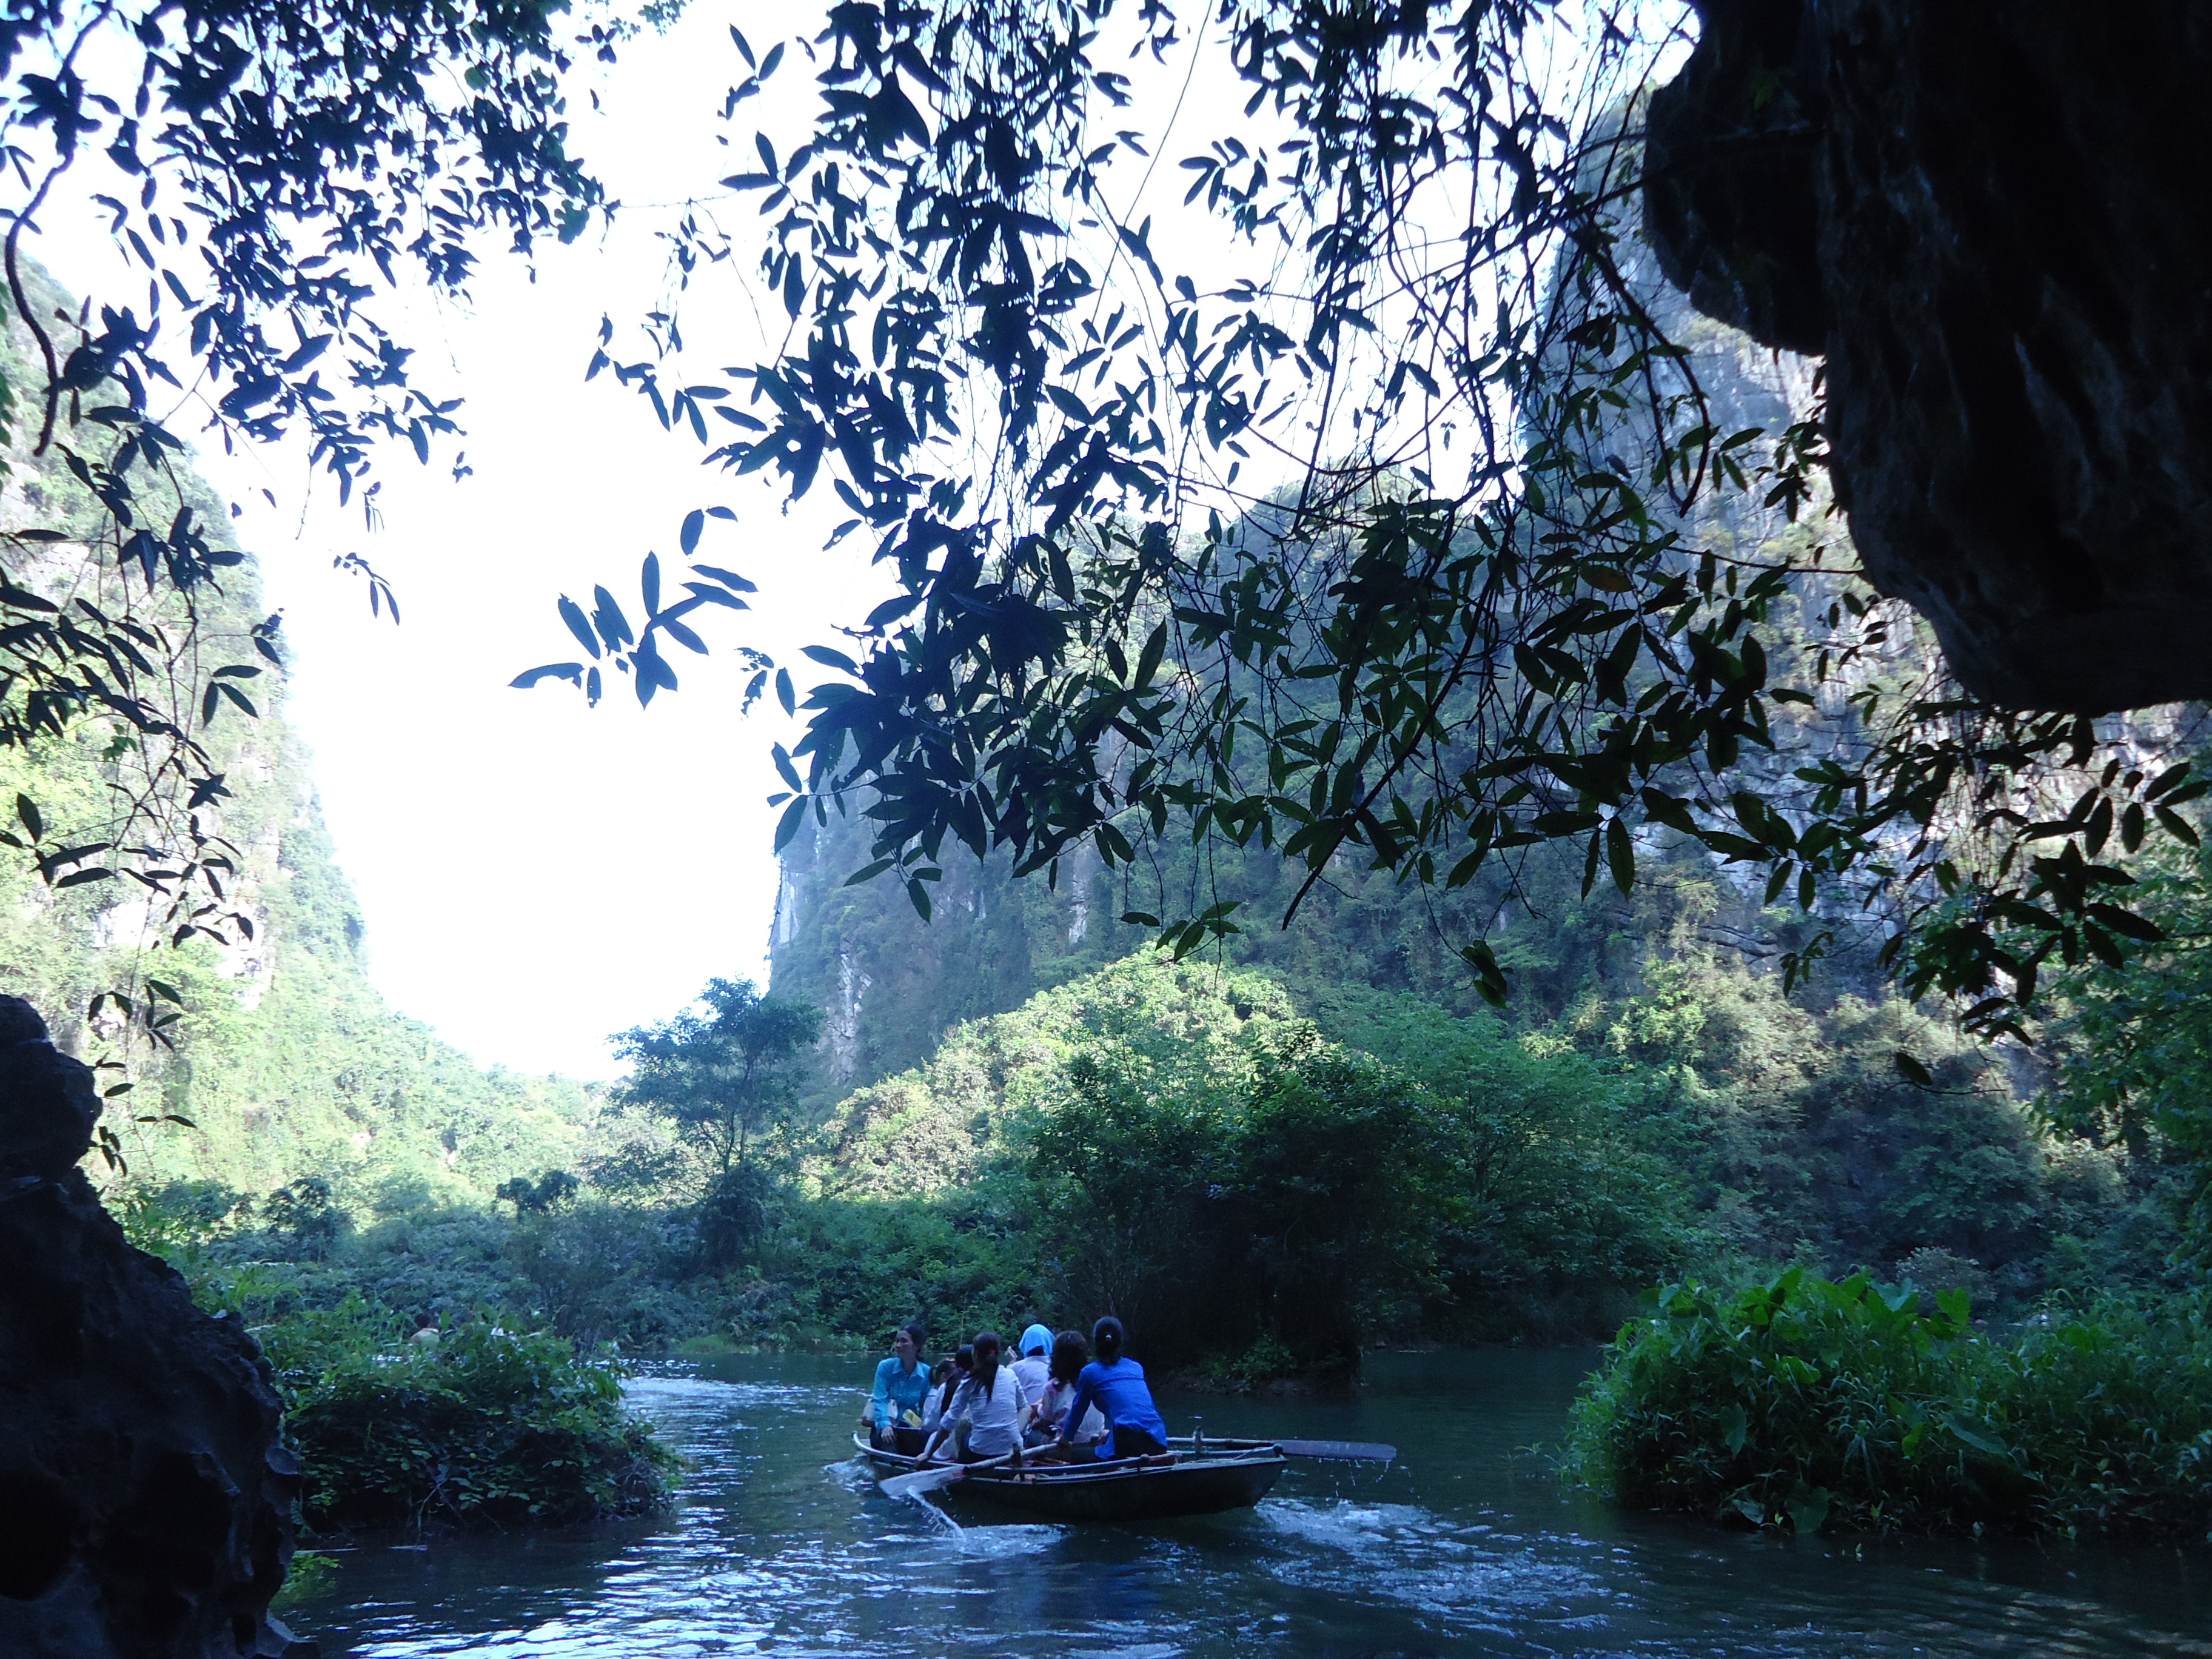 Minh Khong huyen thoai Bai Dinh